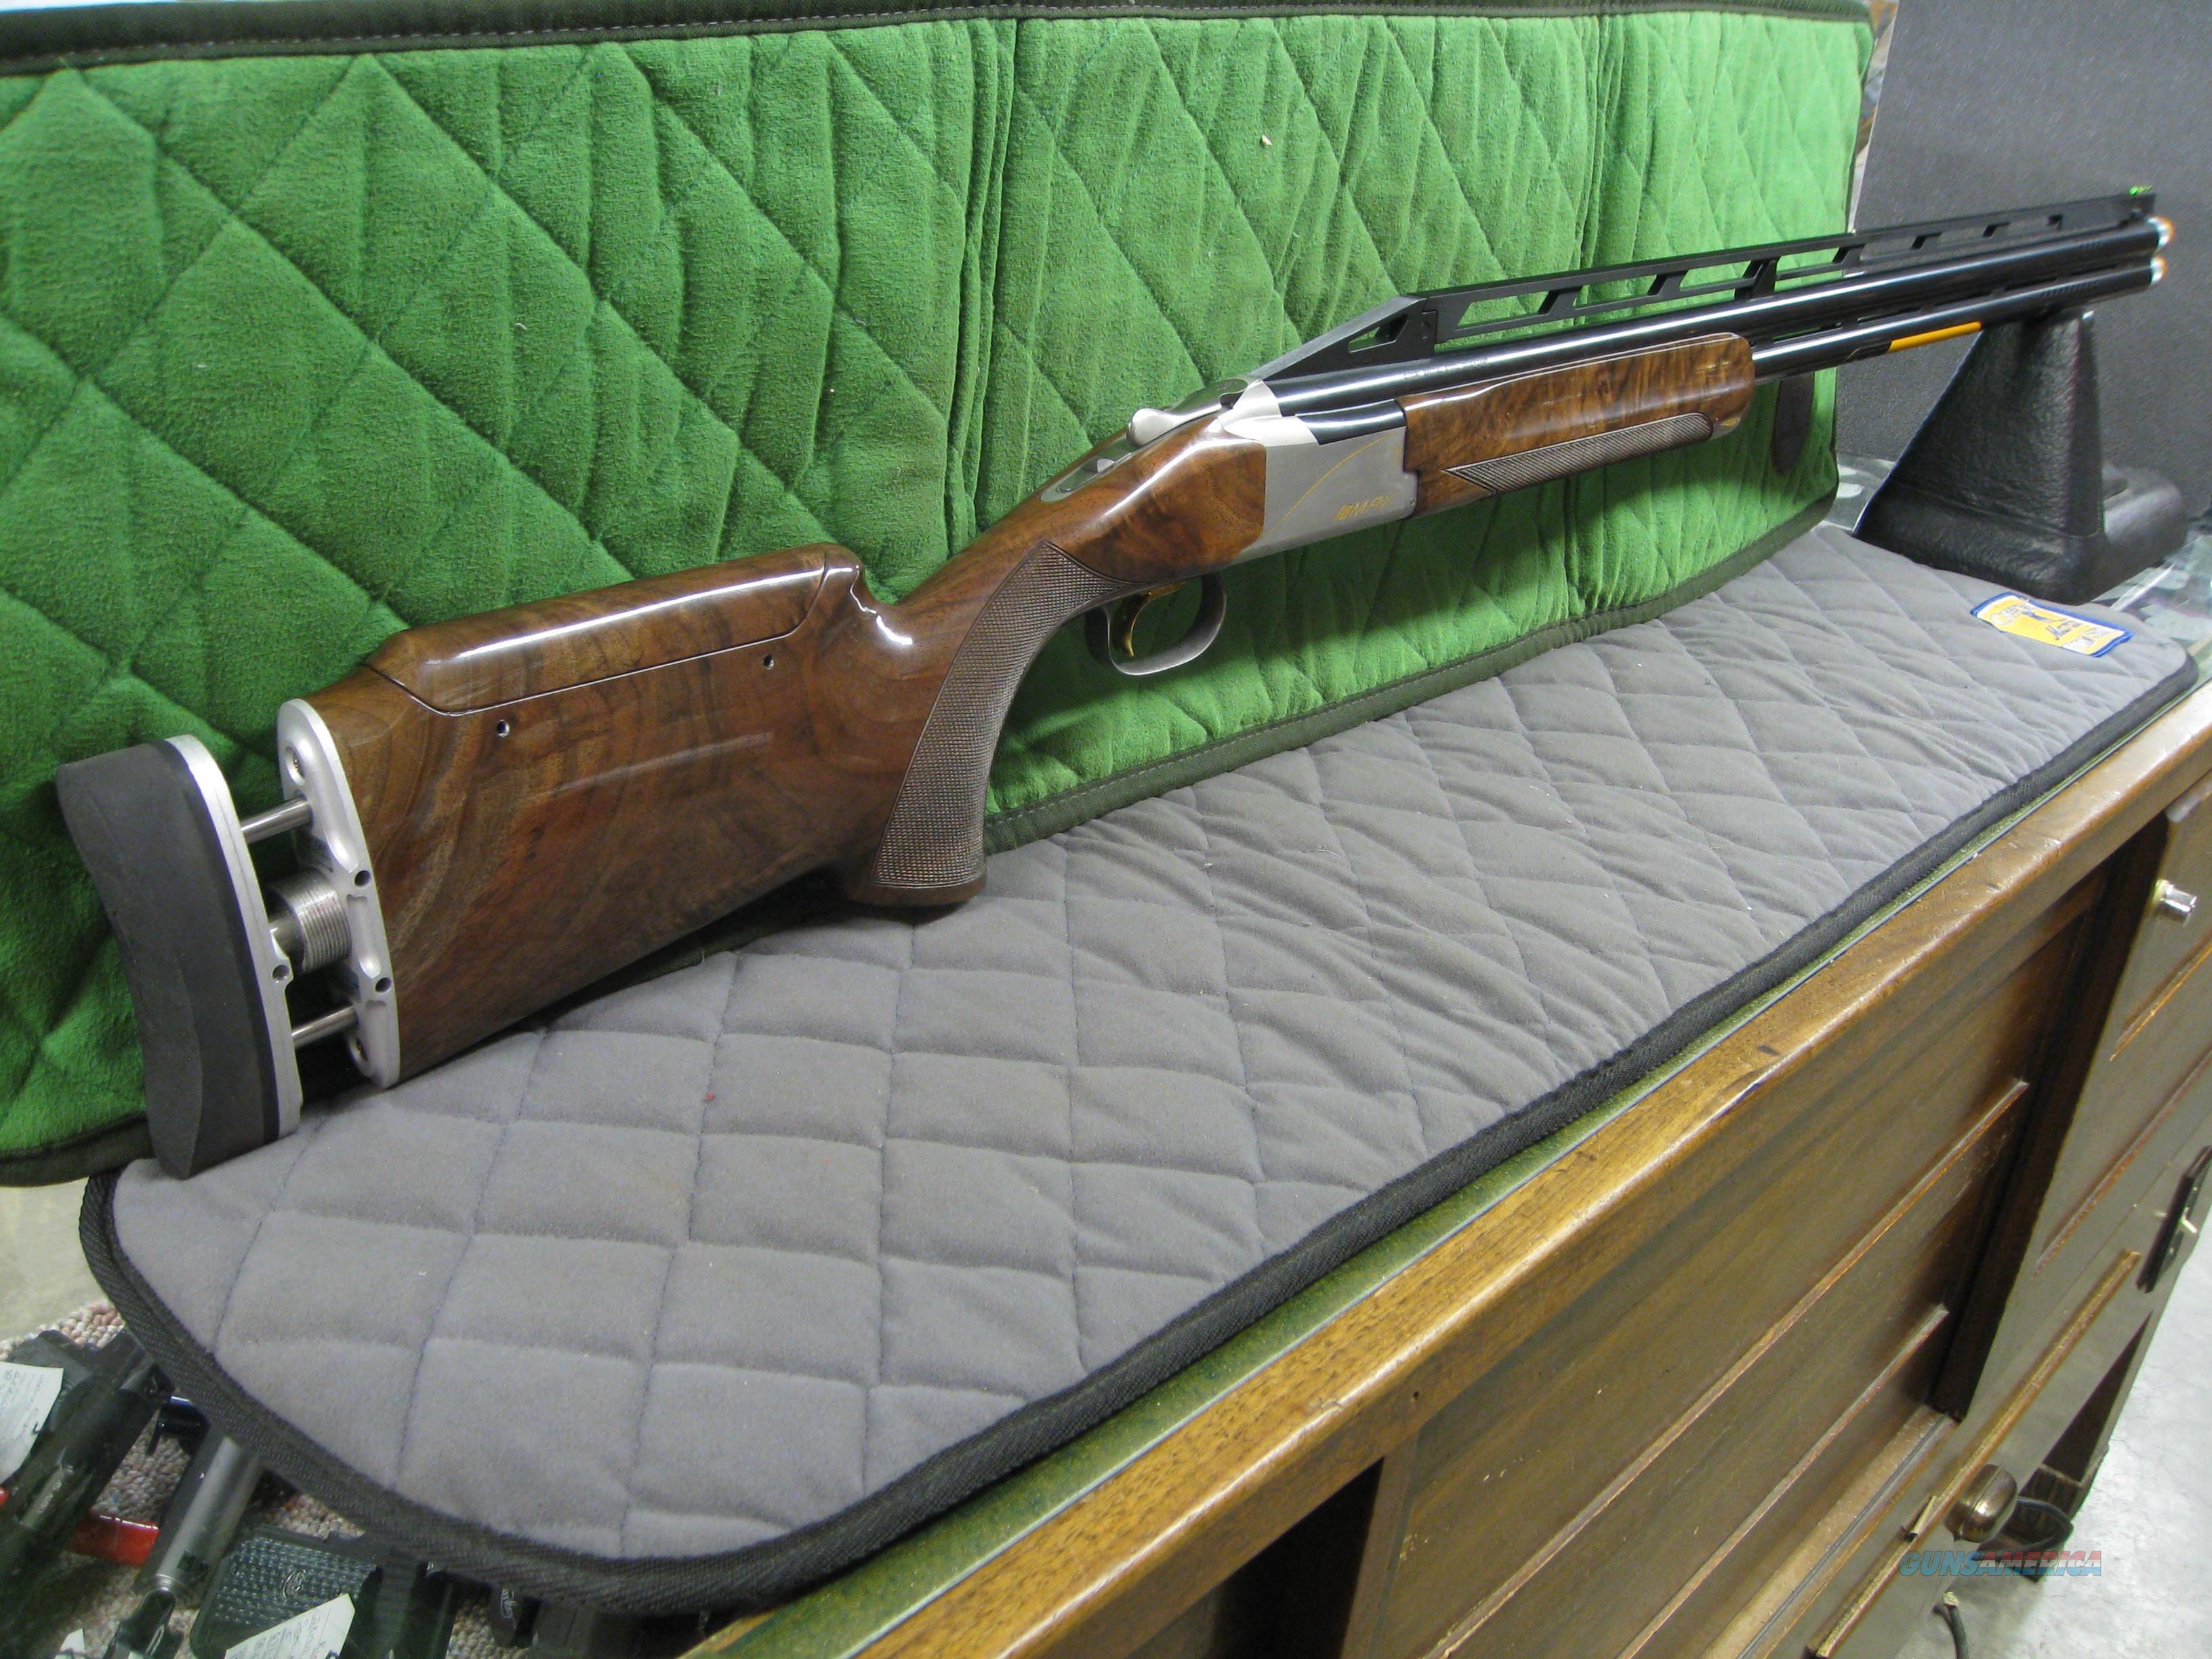 "Browning Citori 725 Trap Max 12 GA 32""  0181624009  Guns > Shotguns > Browning Shotguns > Over Unders > Citori > Trap/Skeet"